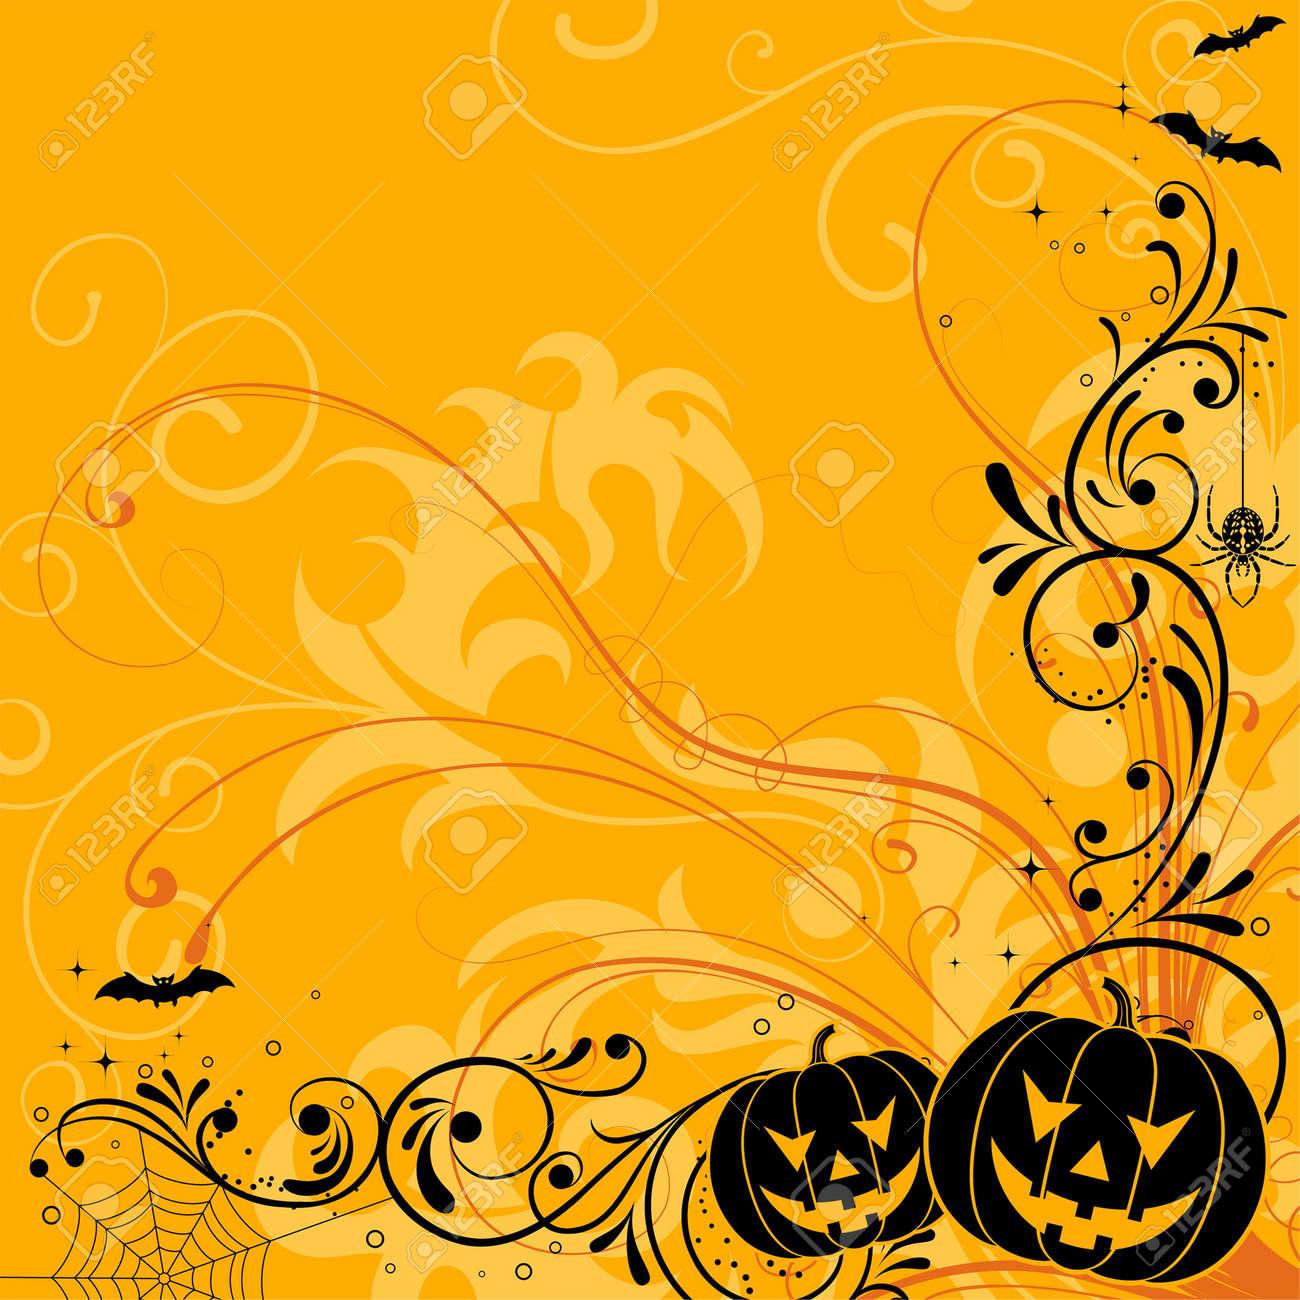 Halloween background with bat, pumpkin, element for design, vector illustration Stock Vector - 5493122